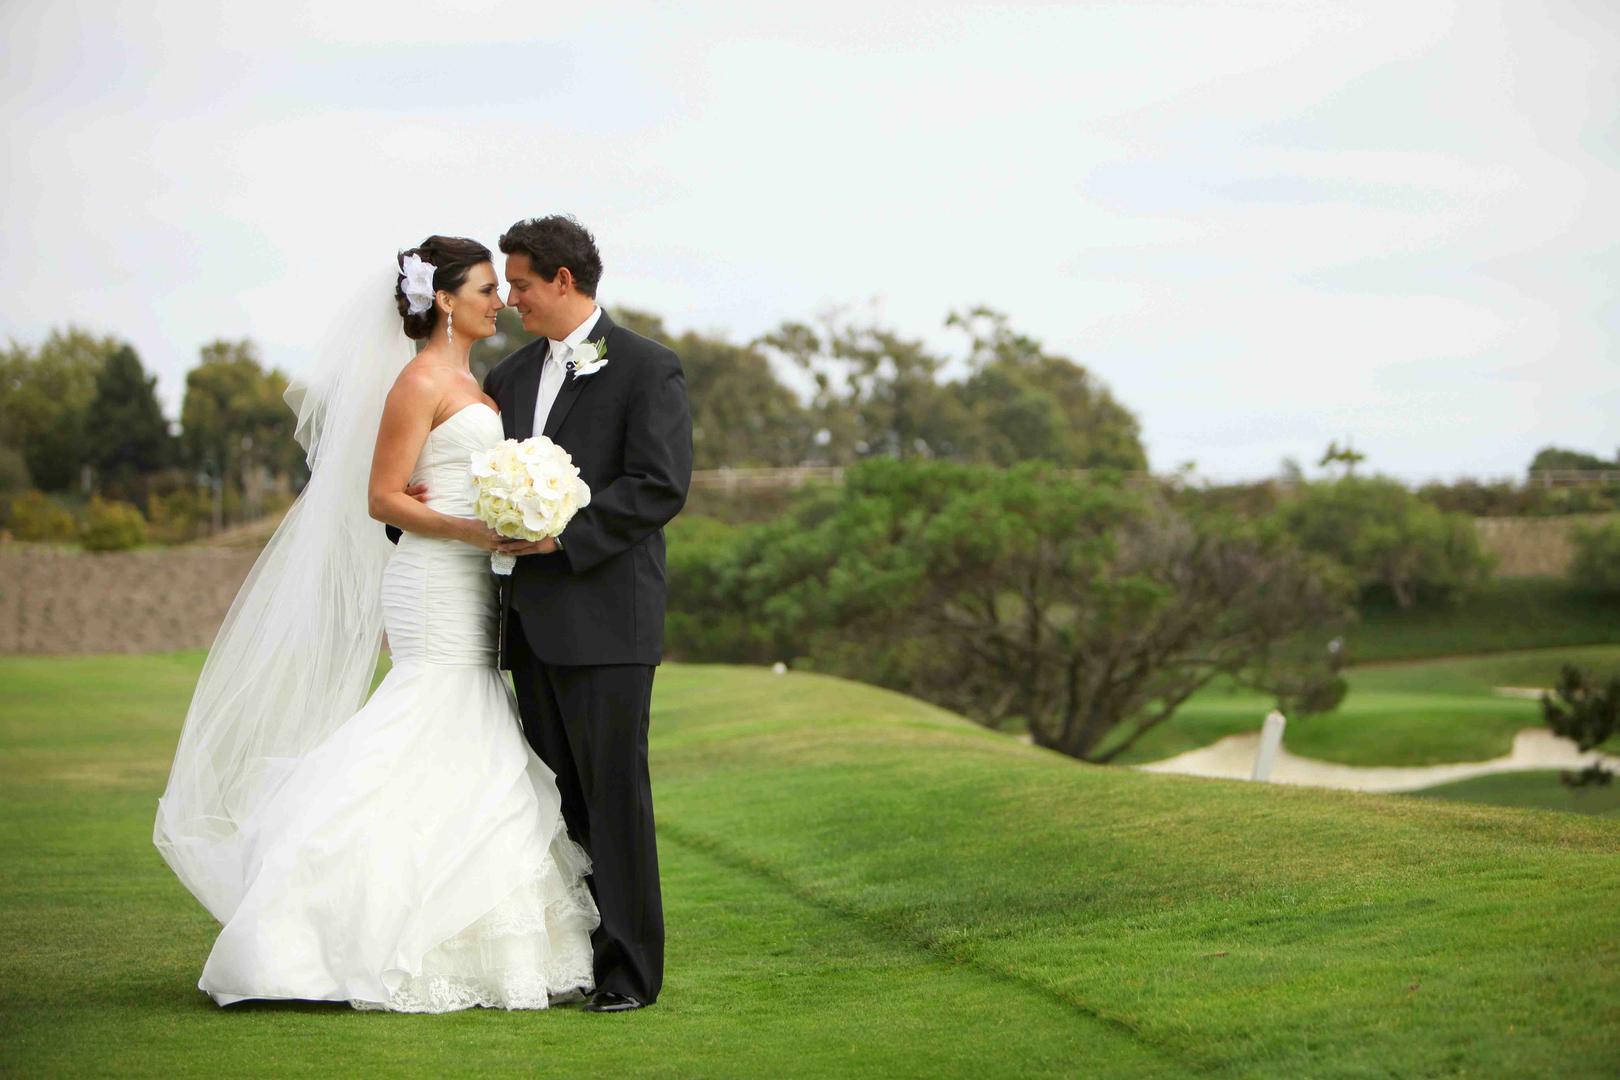 Wedding Registry Wedding Gift Ideas Inside Weddings